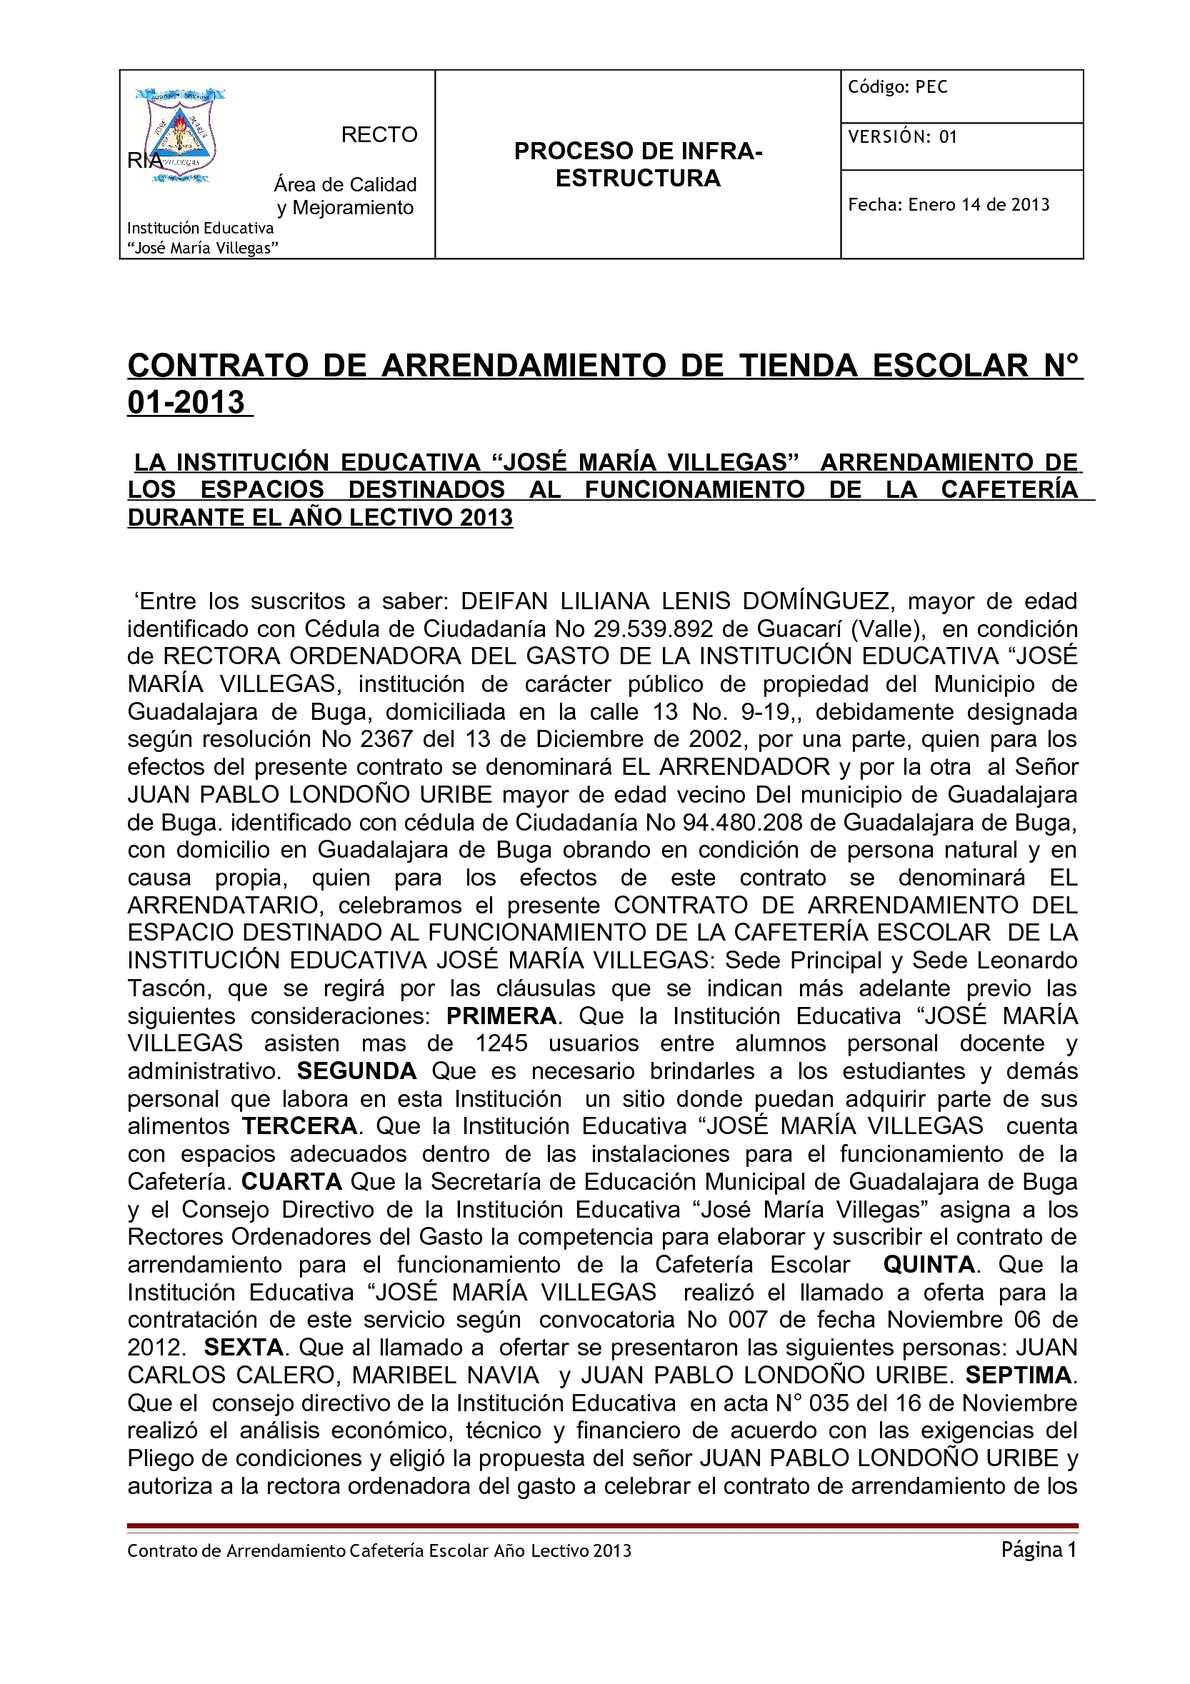 Calaméo - CONTRATO - TIENDA ESCOLAR - 2013